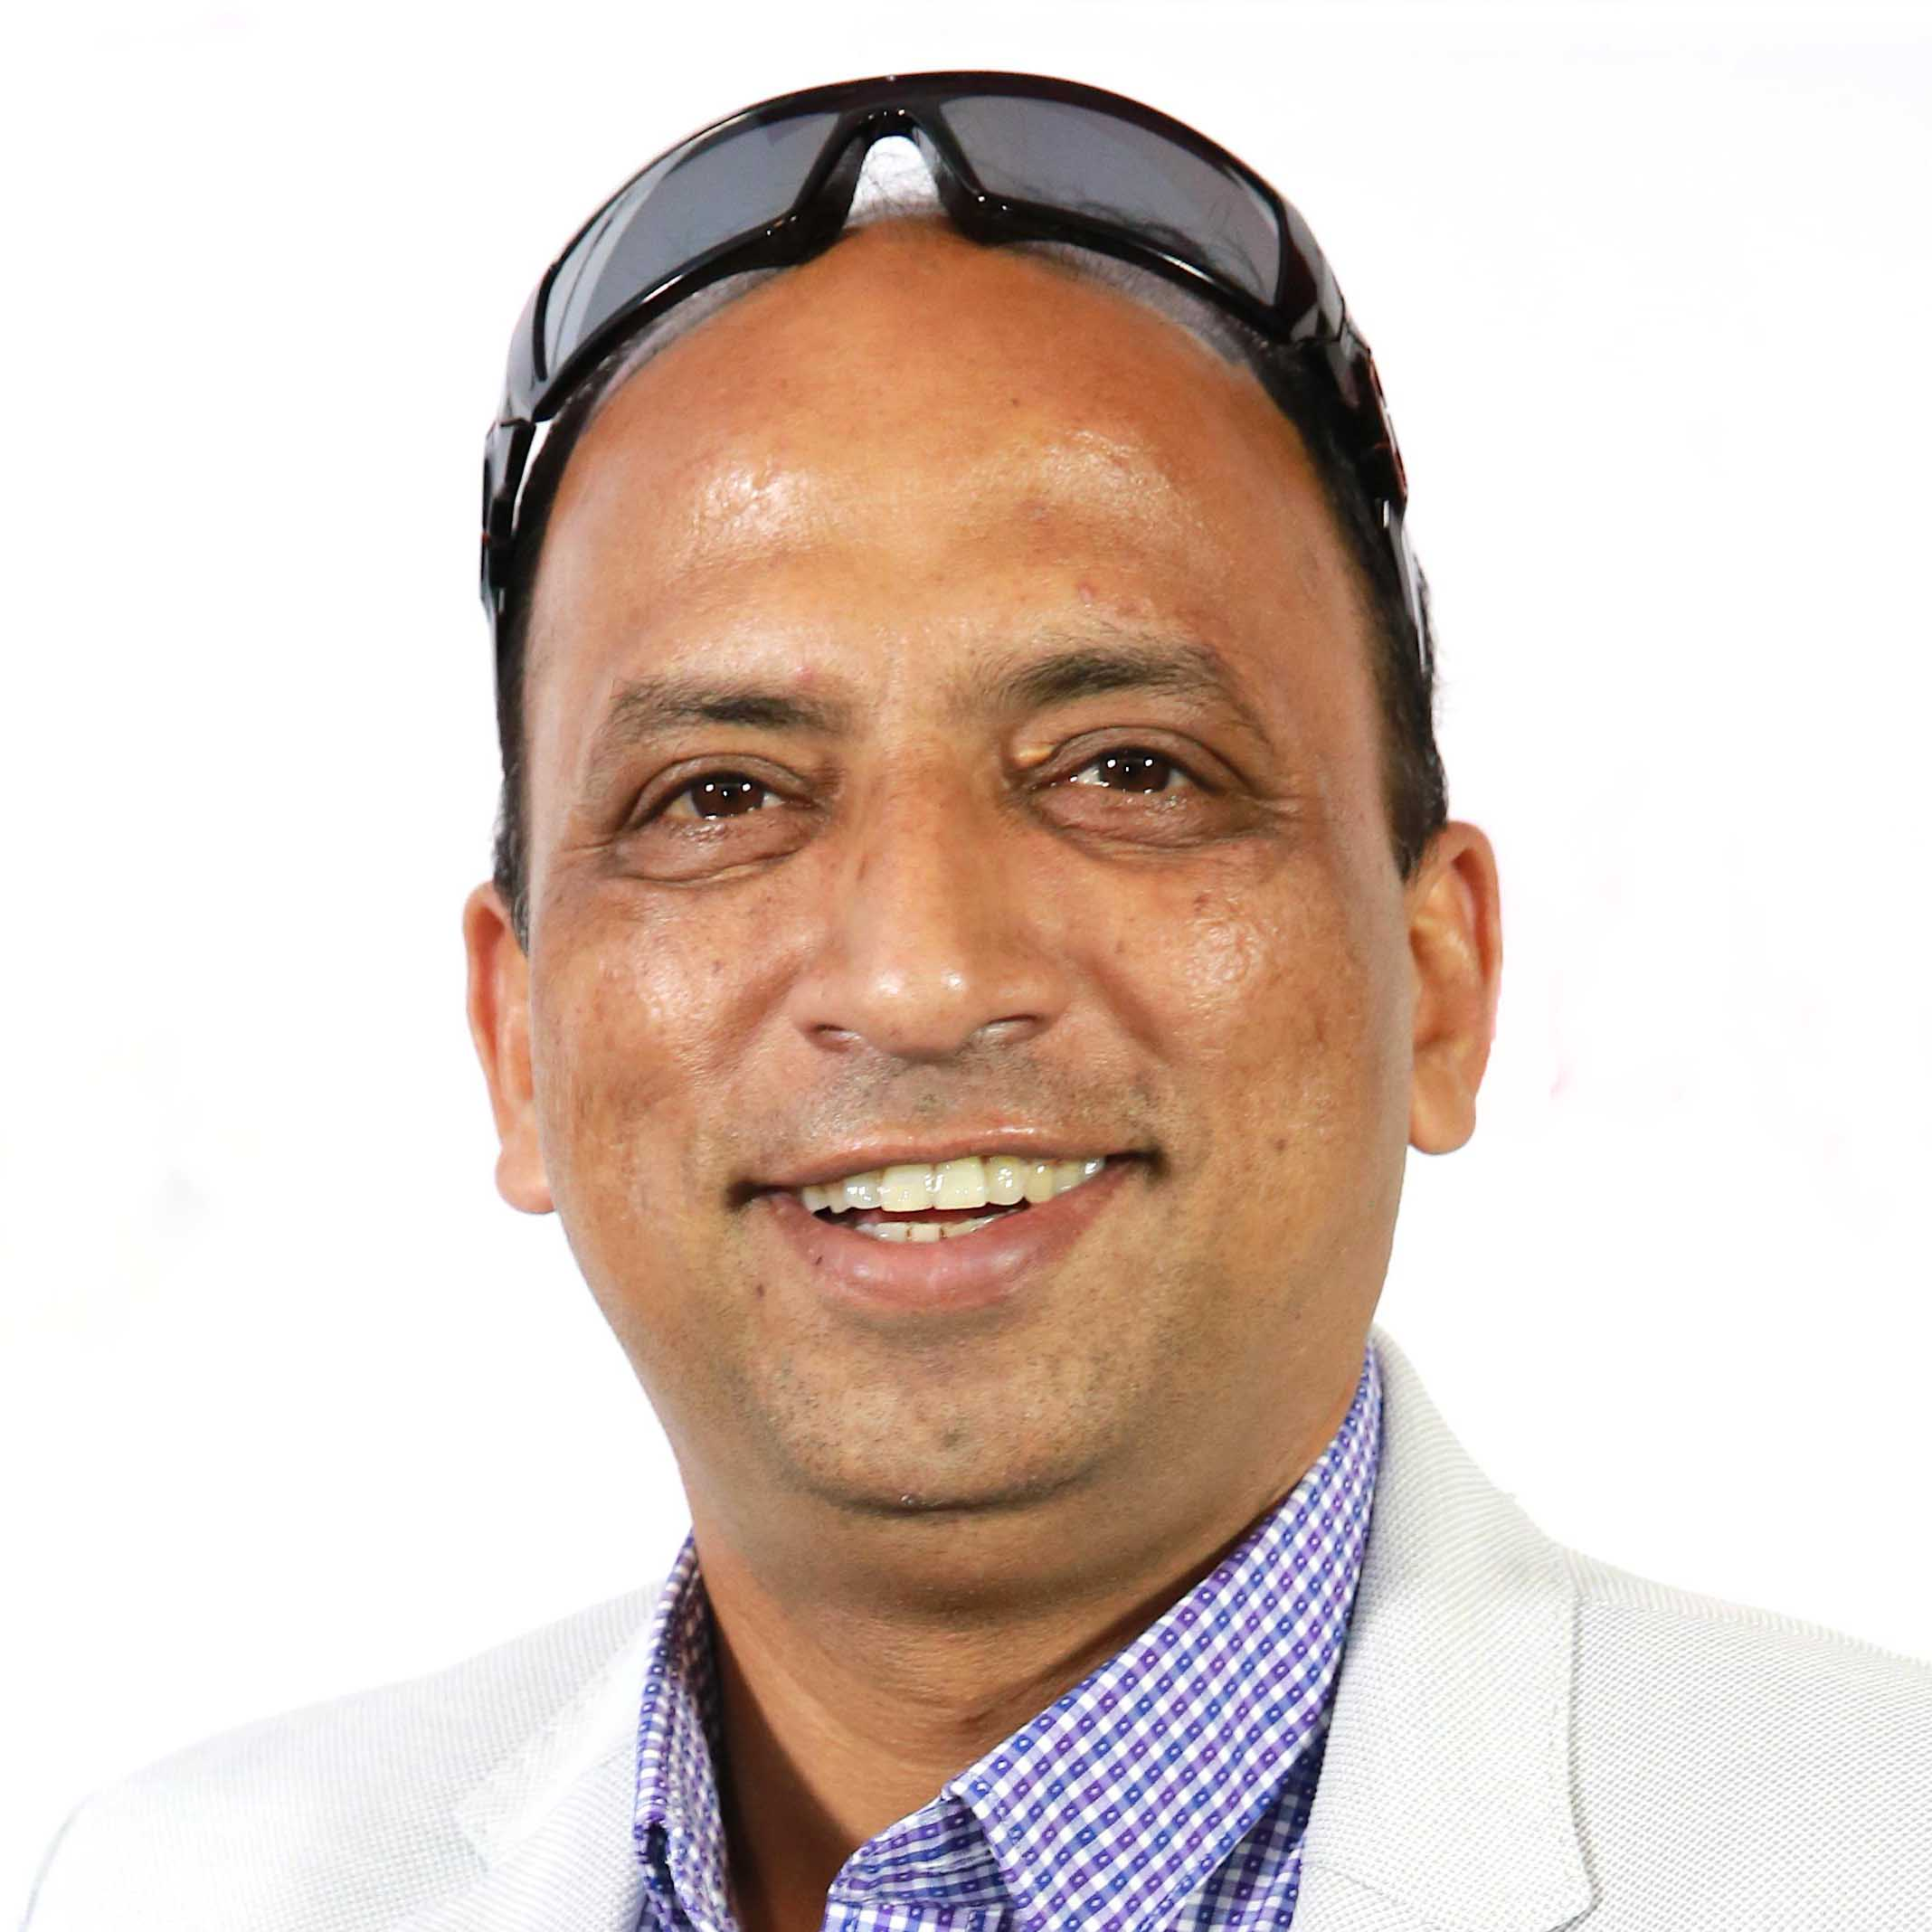 Vishal Gupta, Director, Unique Finance Services